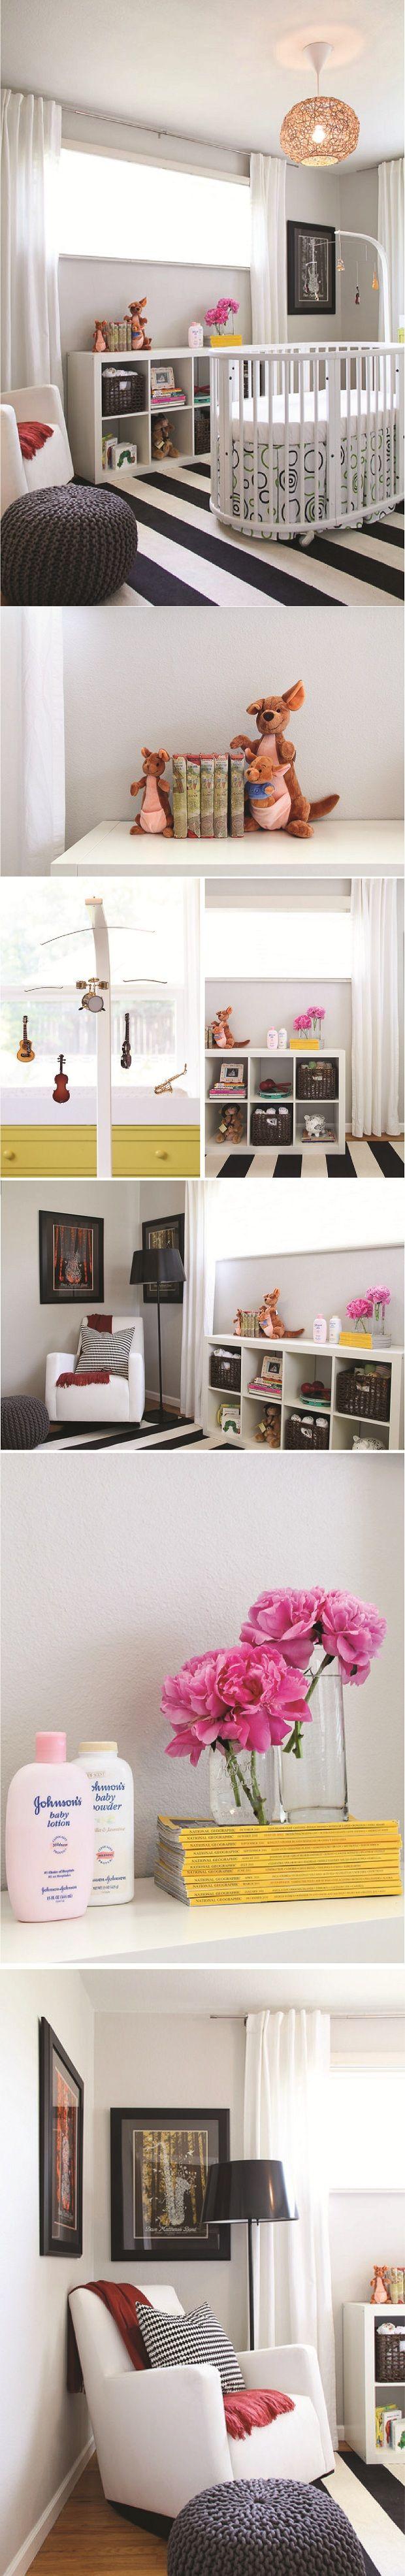 174 best baby | modern b&w nursery images on Pinterest | Nursery ...